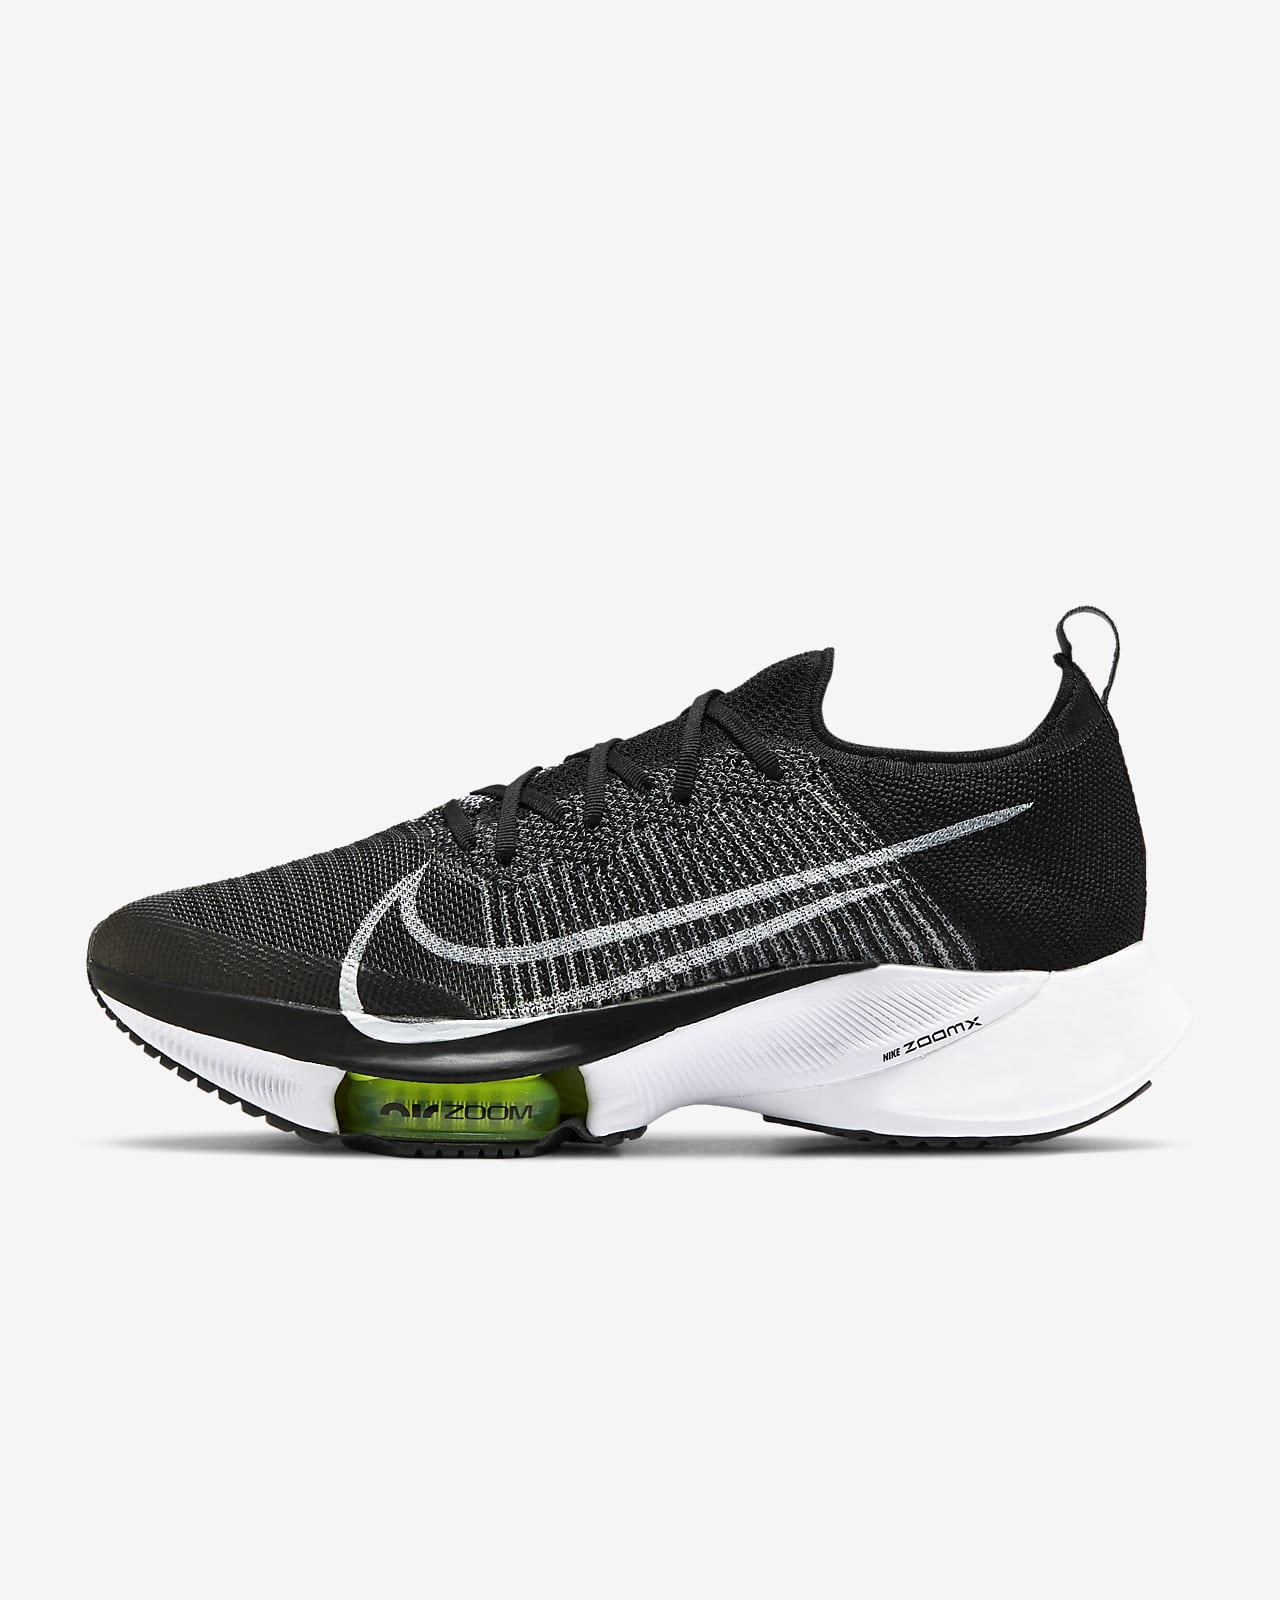 Nike Air Zoom Tempo NEXT% Men's Running Shoe. Nike LU